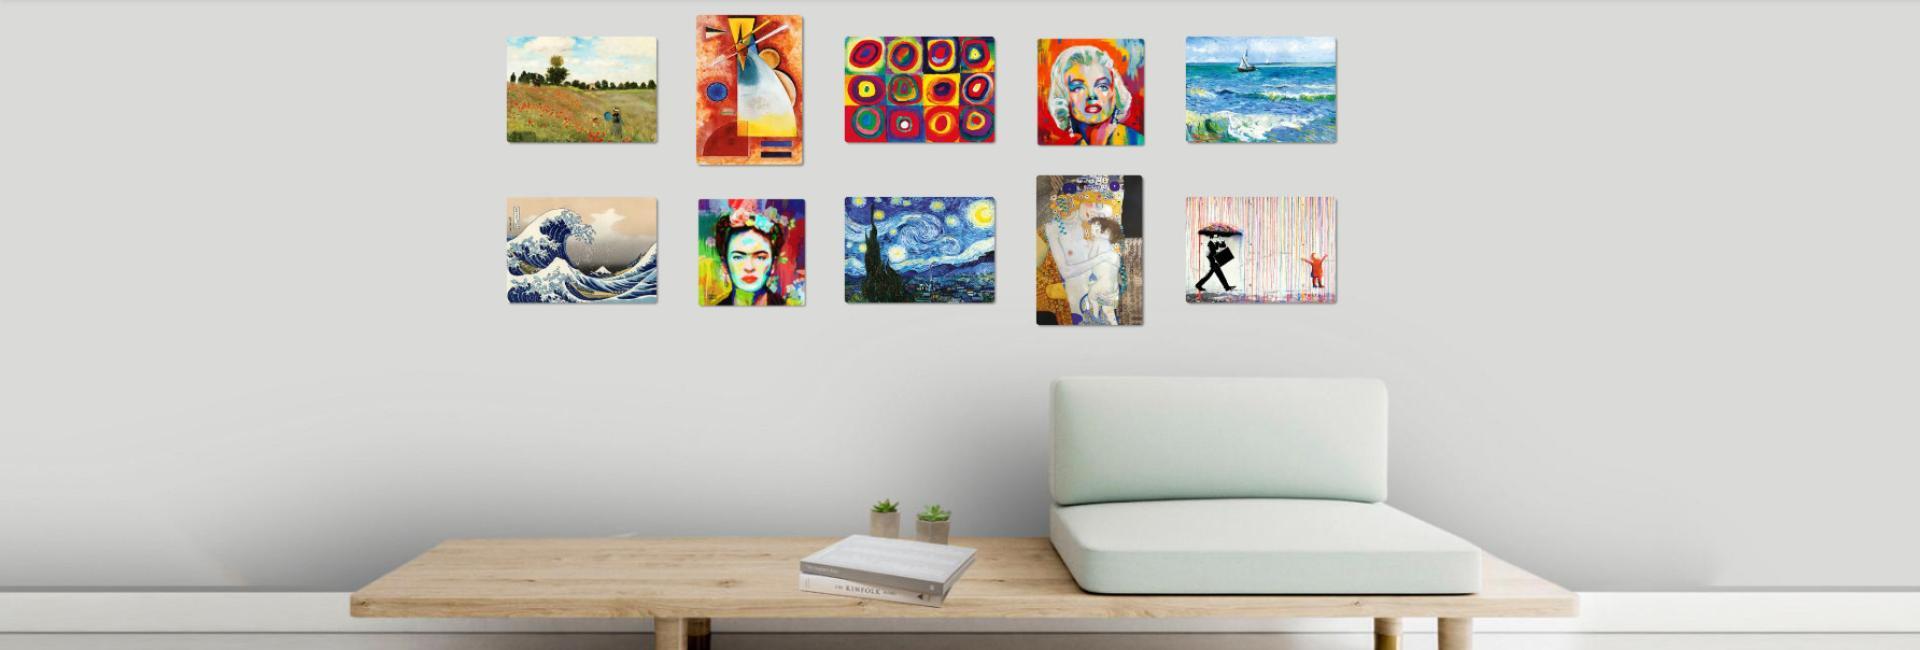 Giallopanel Art Board